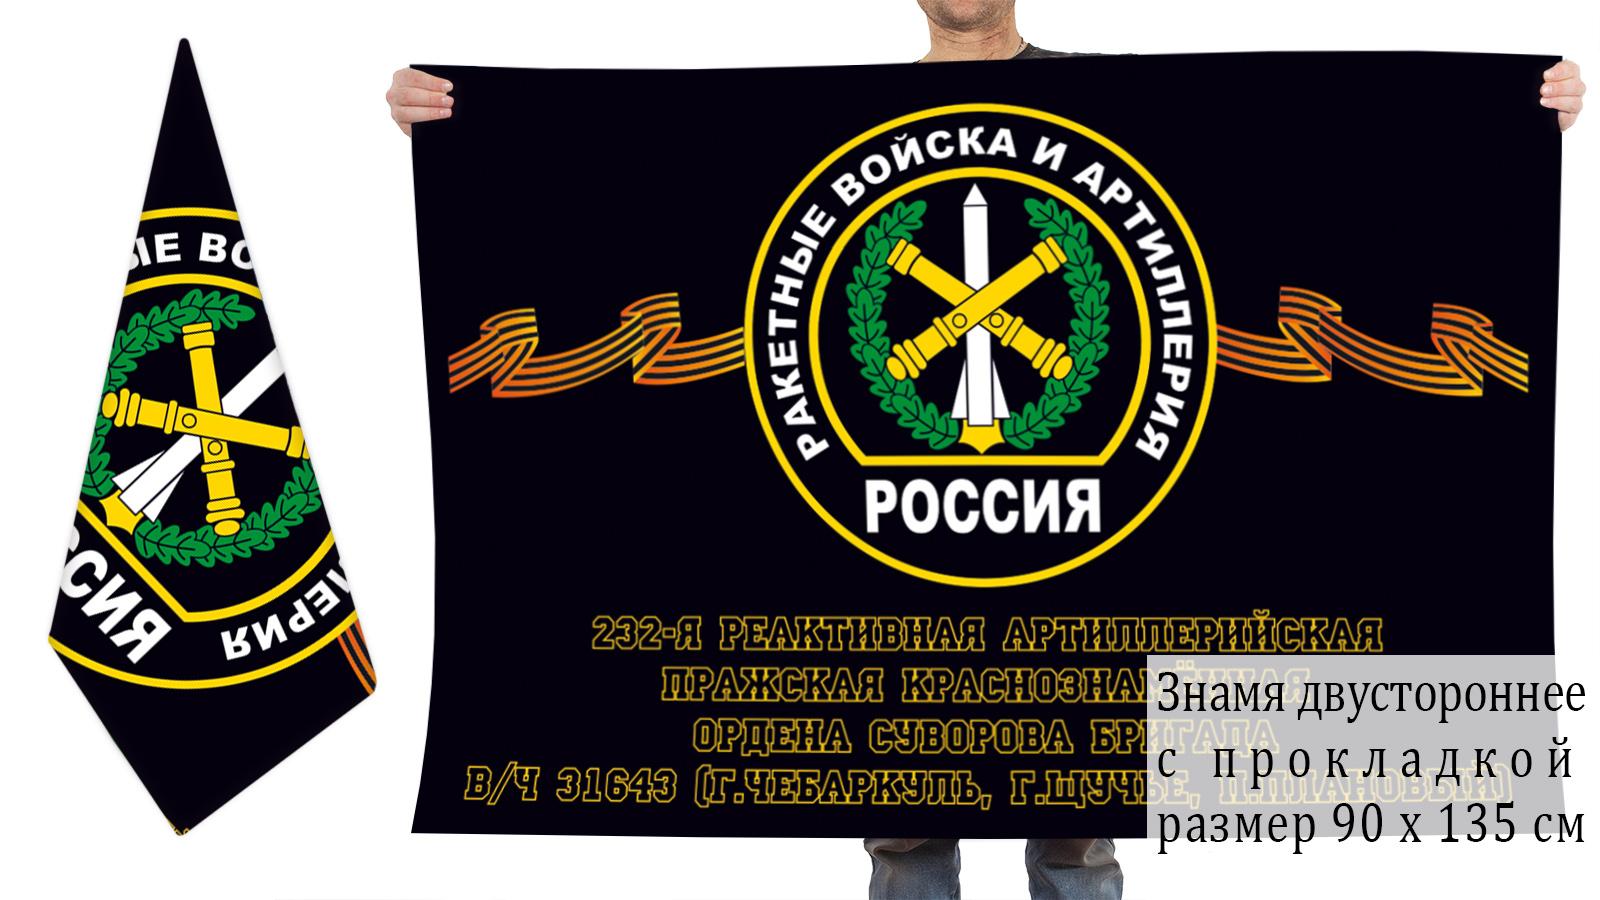 Двусторонний флаг 232 Пражской реактивной артиллерийской бригады